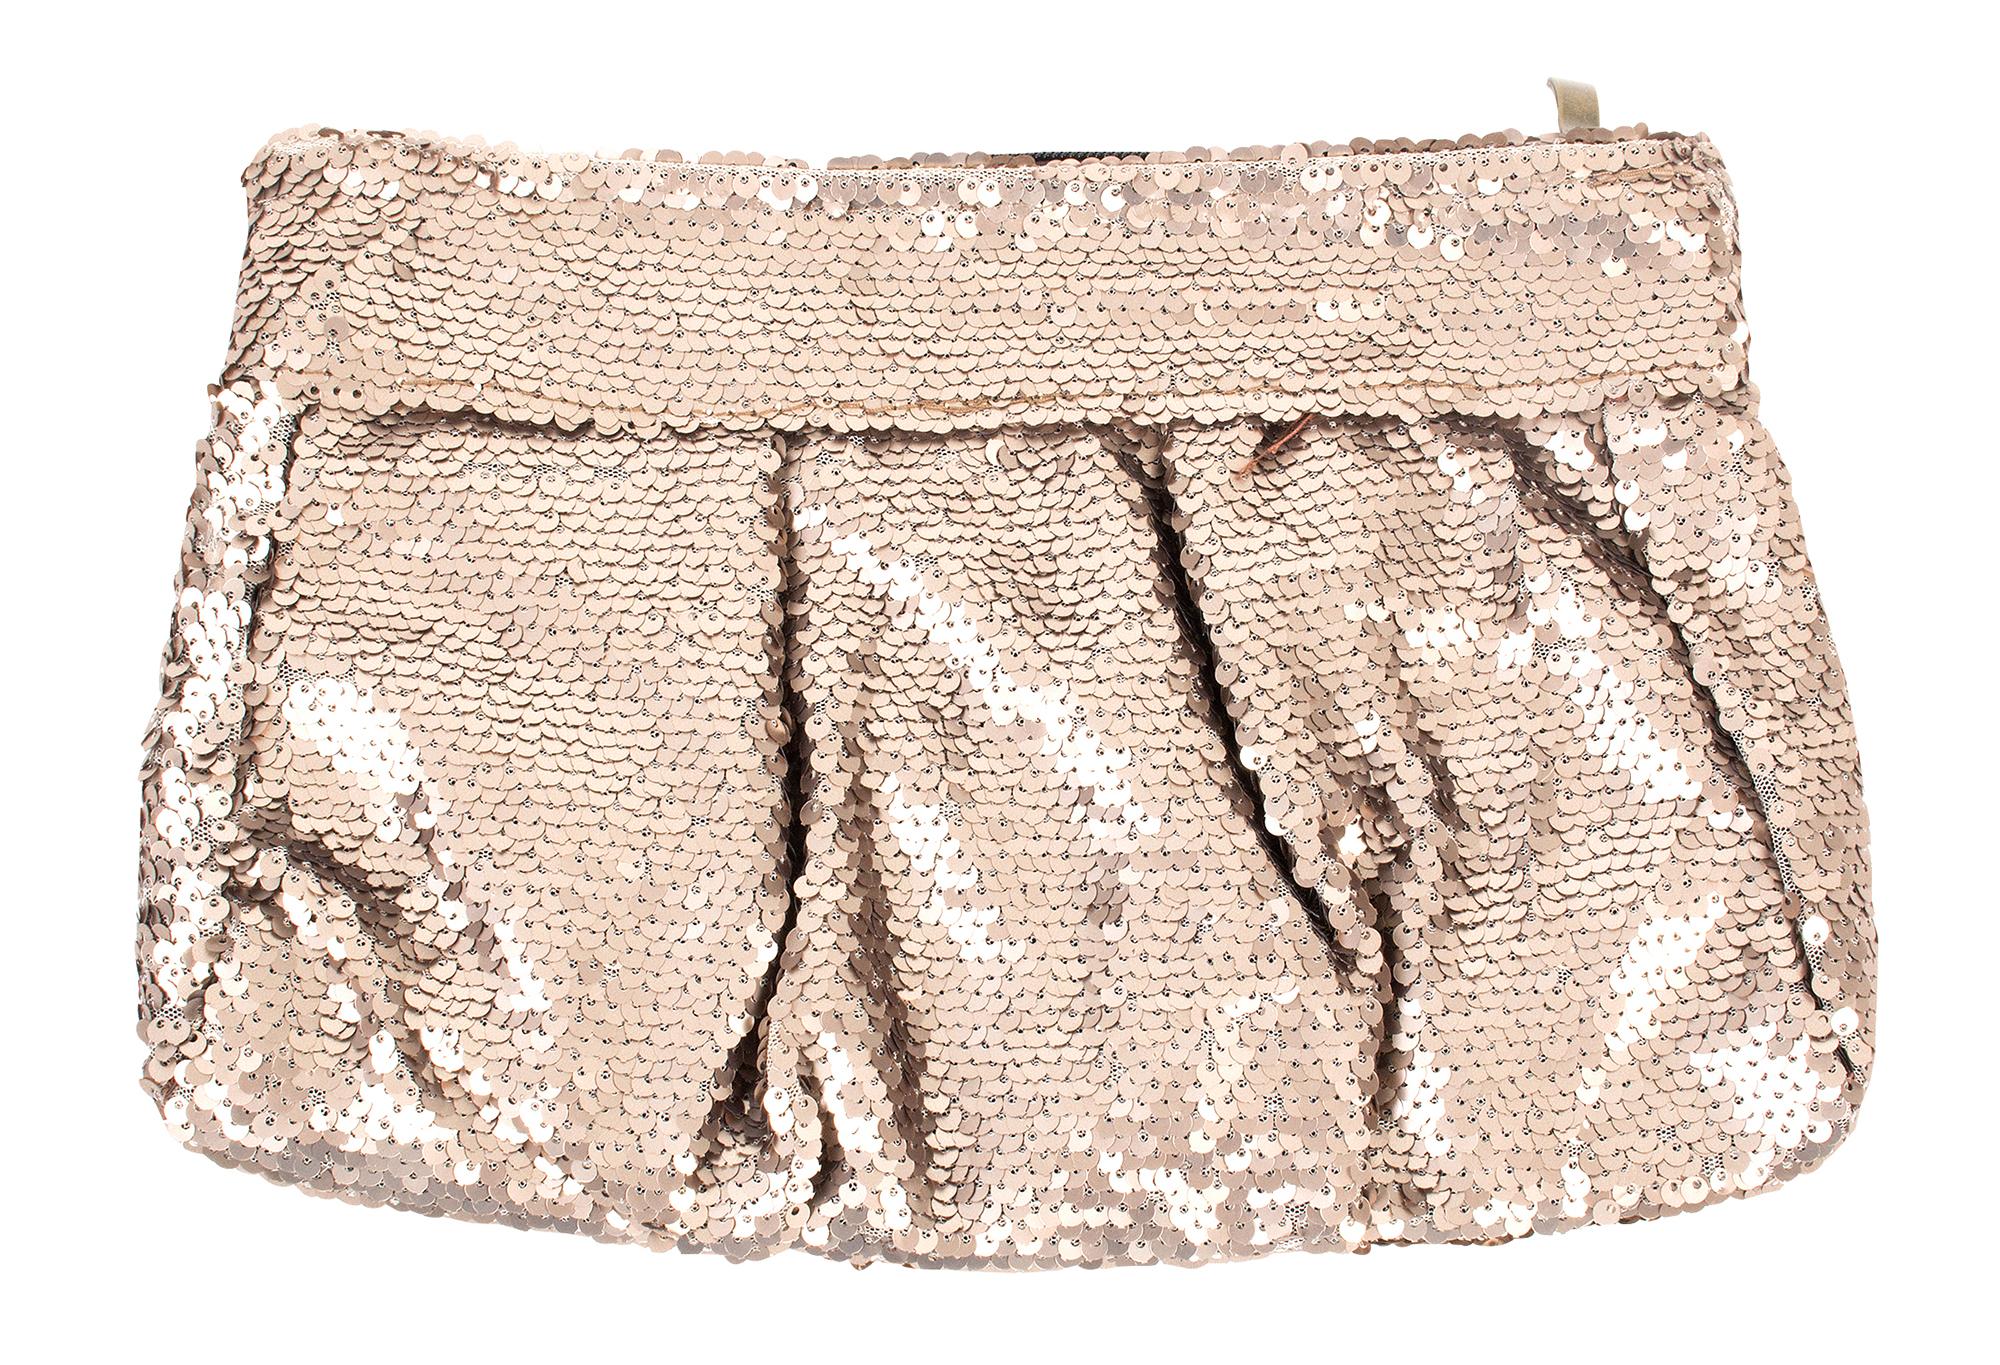 Muche et Muchette sequin clutch, $50 at Copper Penny